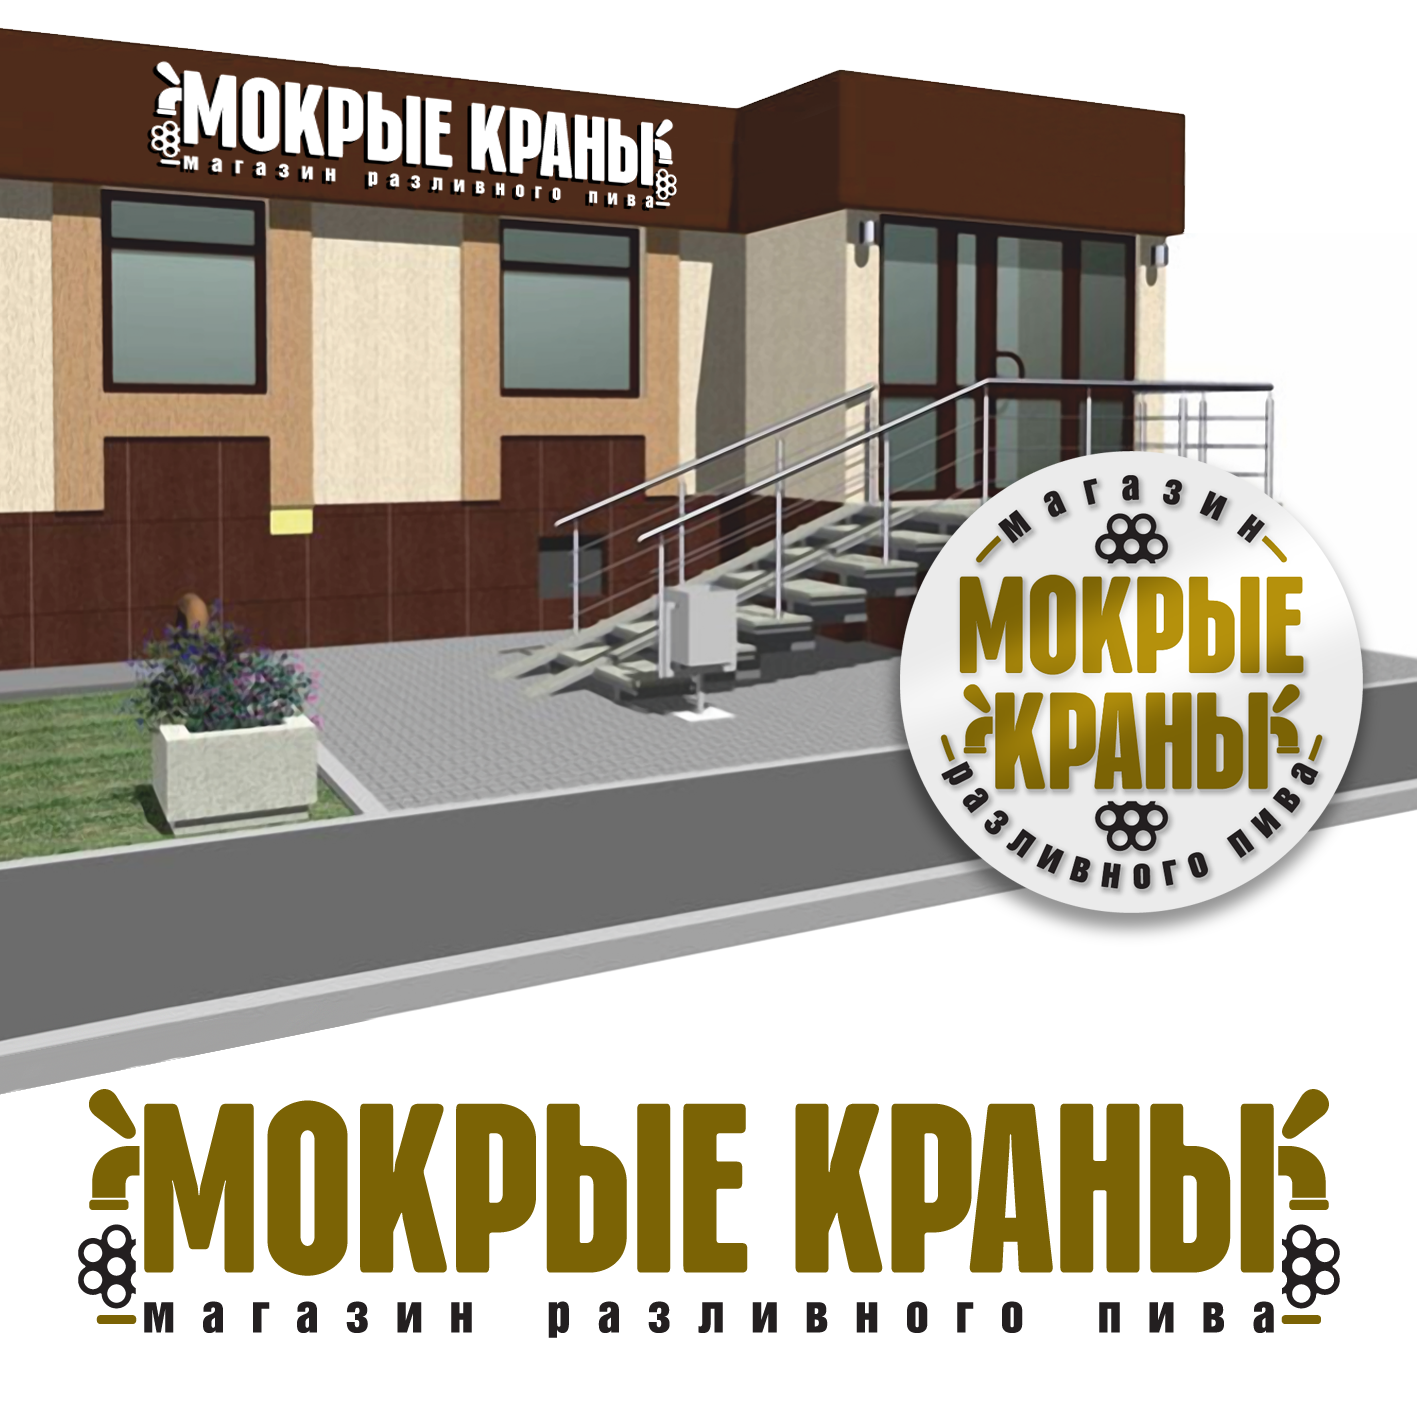 Вывеска/логотип для пивного магазина фото f_51360227fea35b03.png